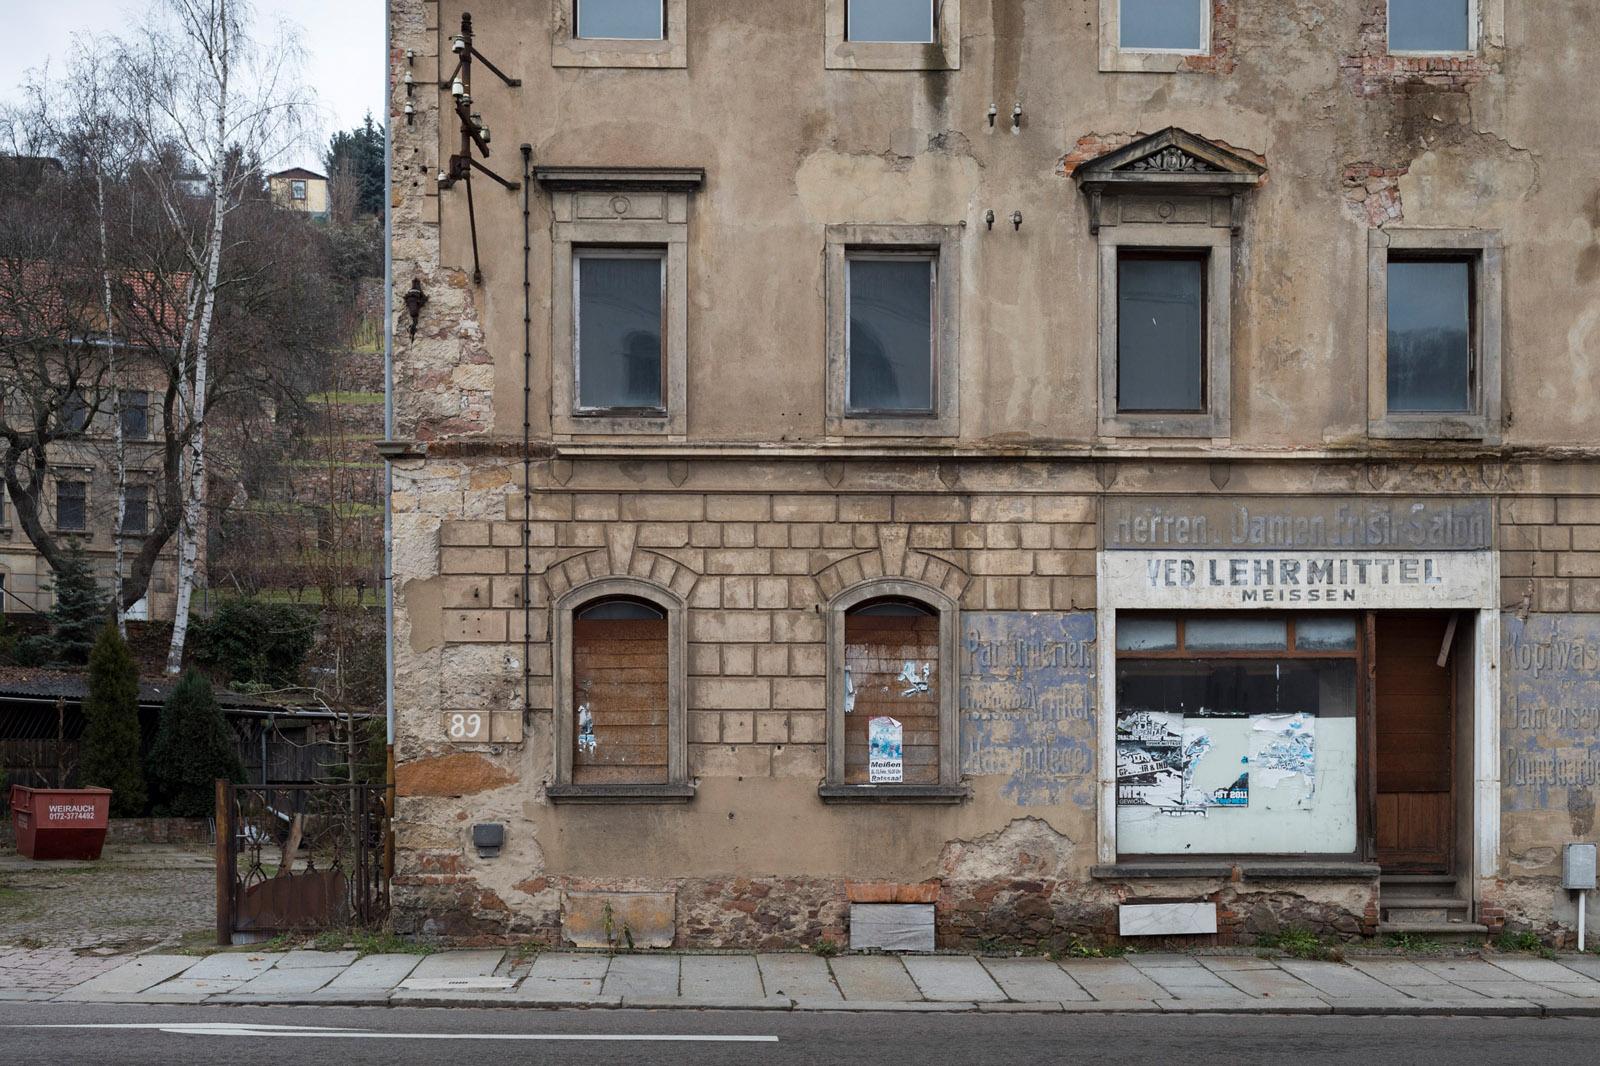 Meissen, Germany. All rights reserved © Tomas Bertelsen